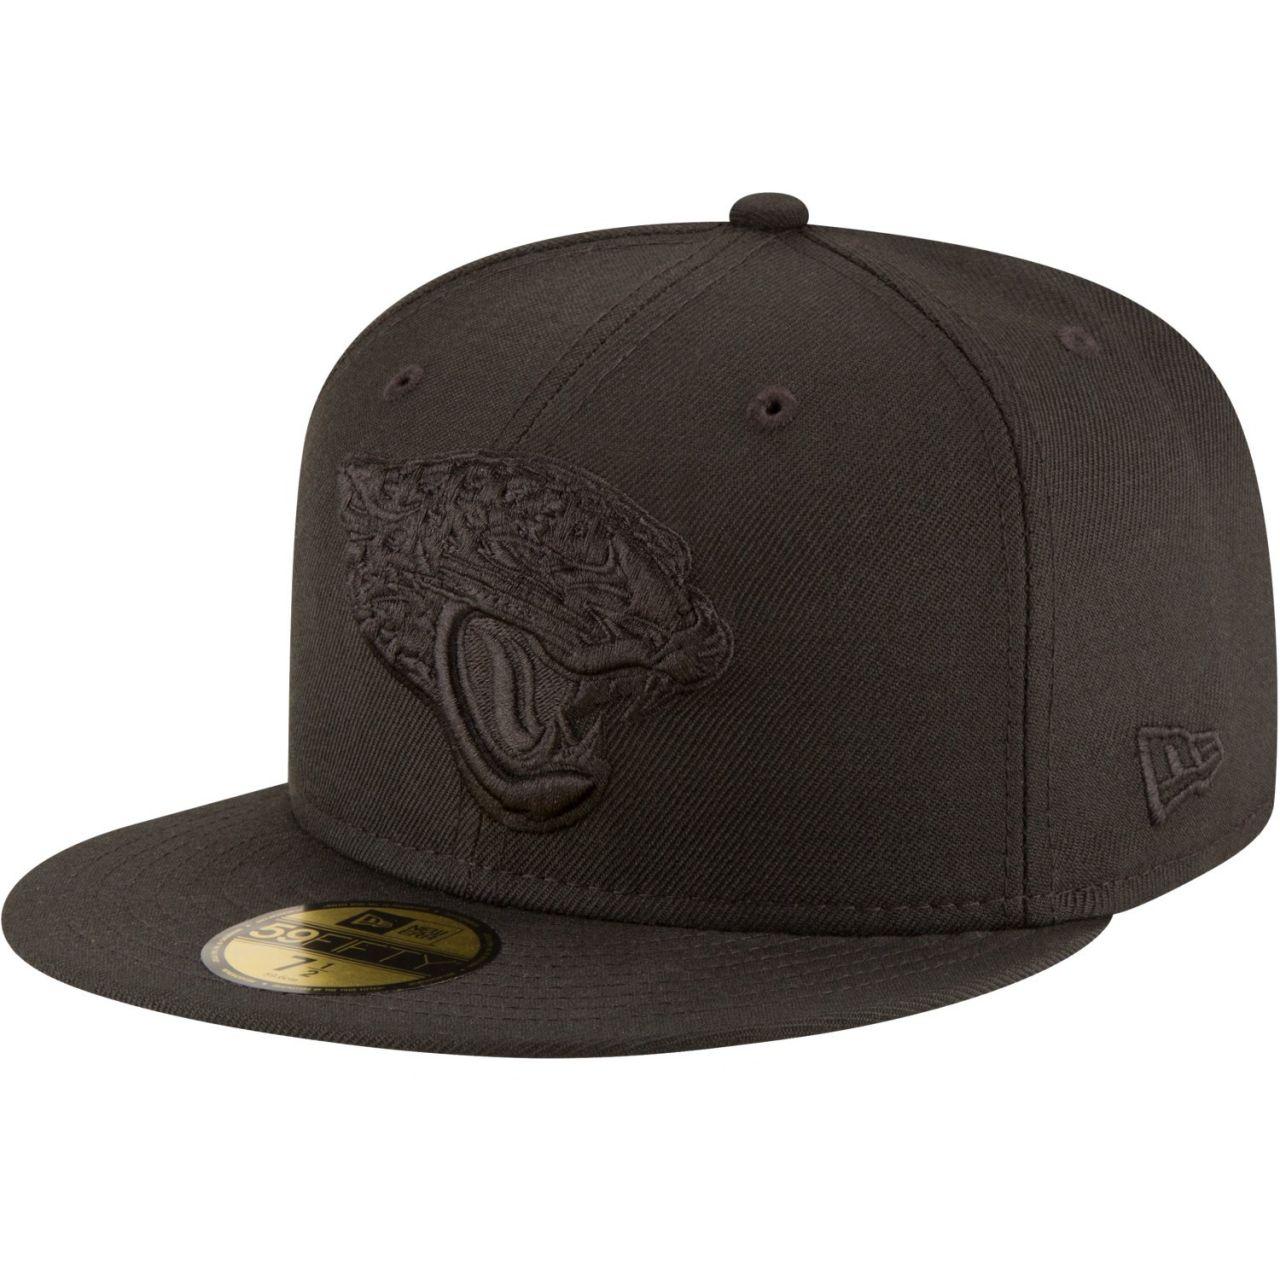 amfoo - New Era 59Fifty Cap - NFL BLACK Jacksonville Jaguars